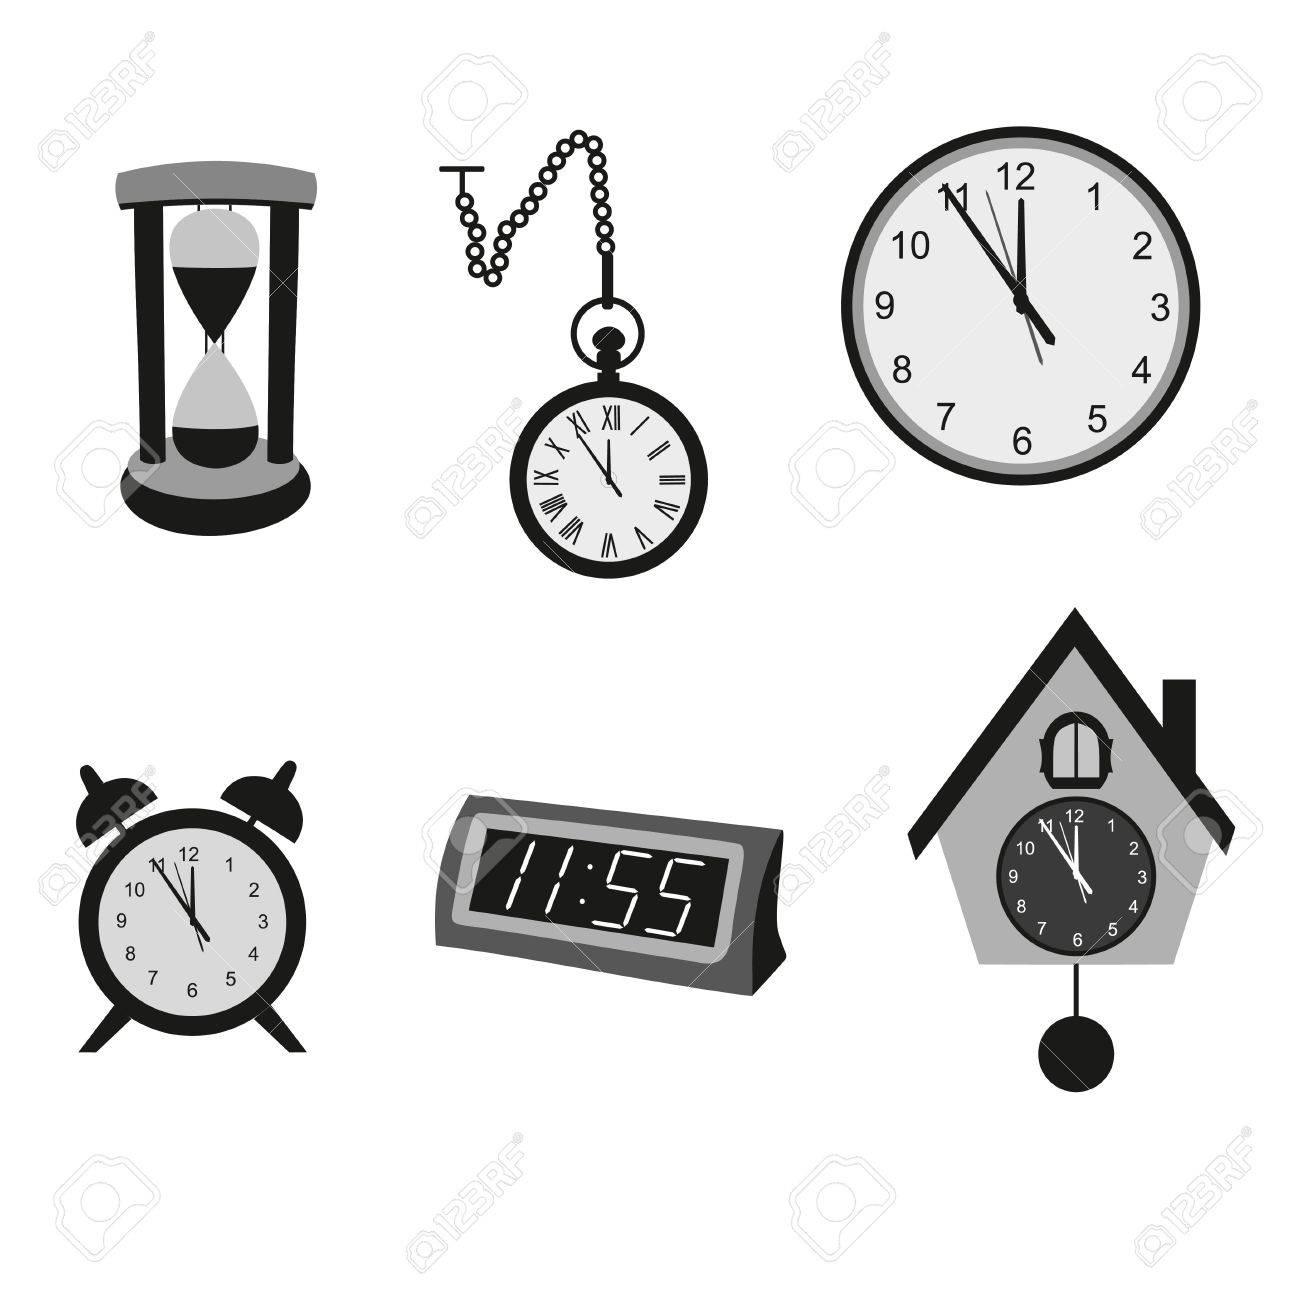 Diferentes Tipos De Relojes Los Diferentes Tipos De Relojes